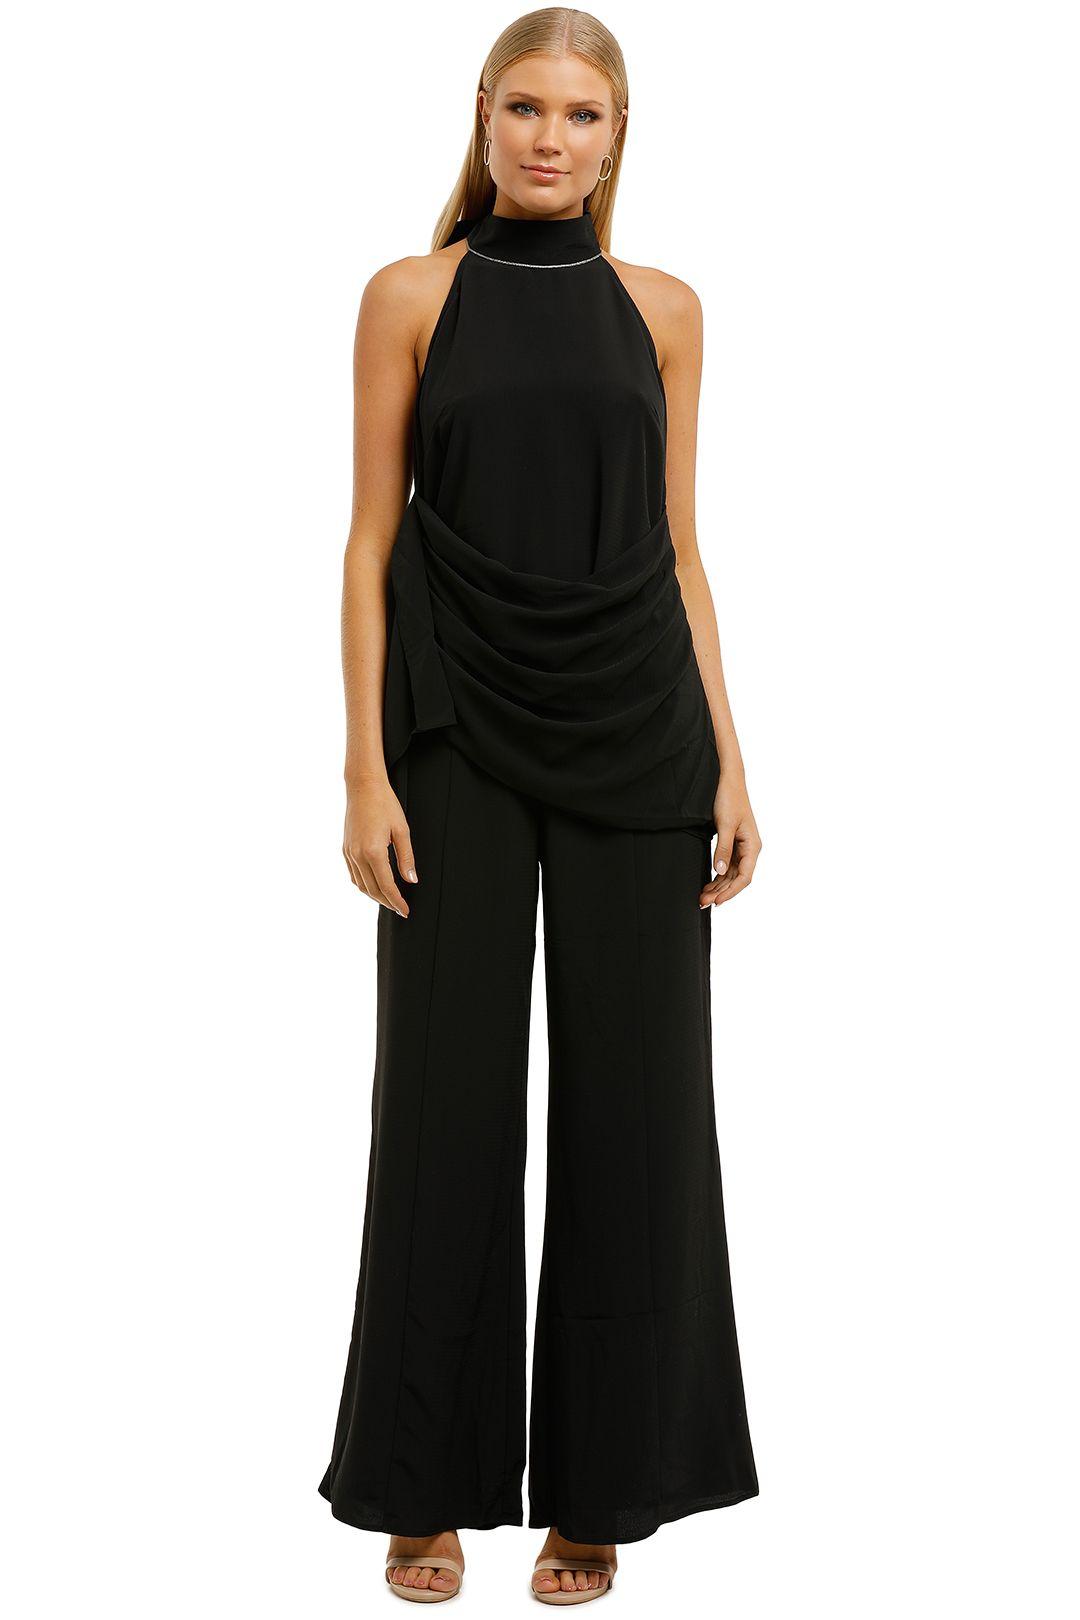 Elliatt-Cacti-Top-and-Pant-Set-Black-Front